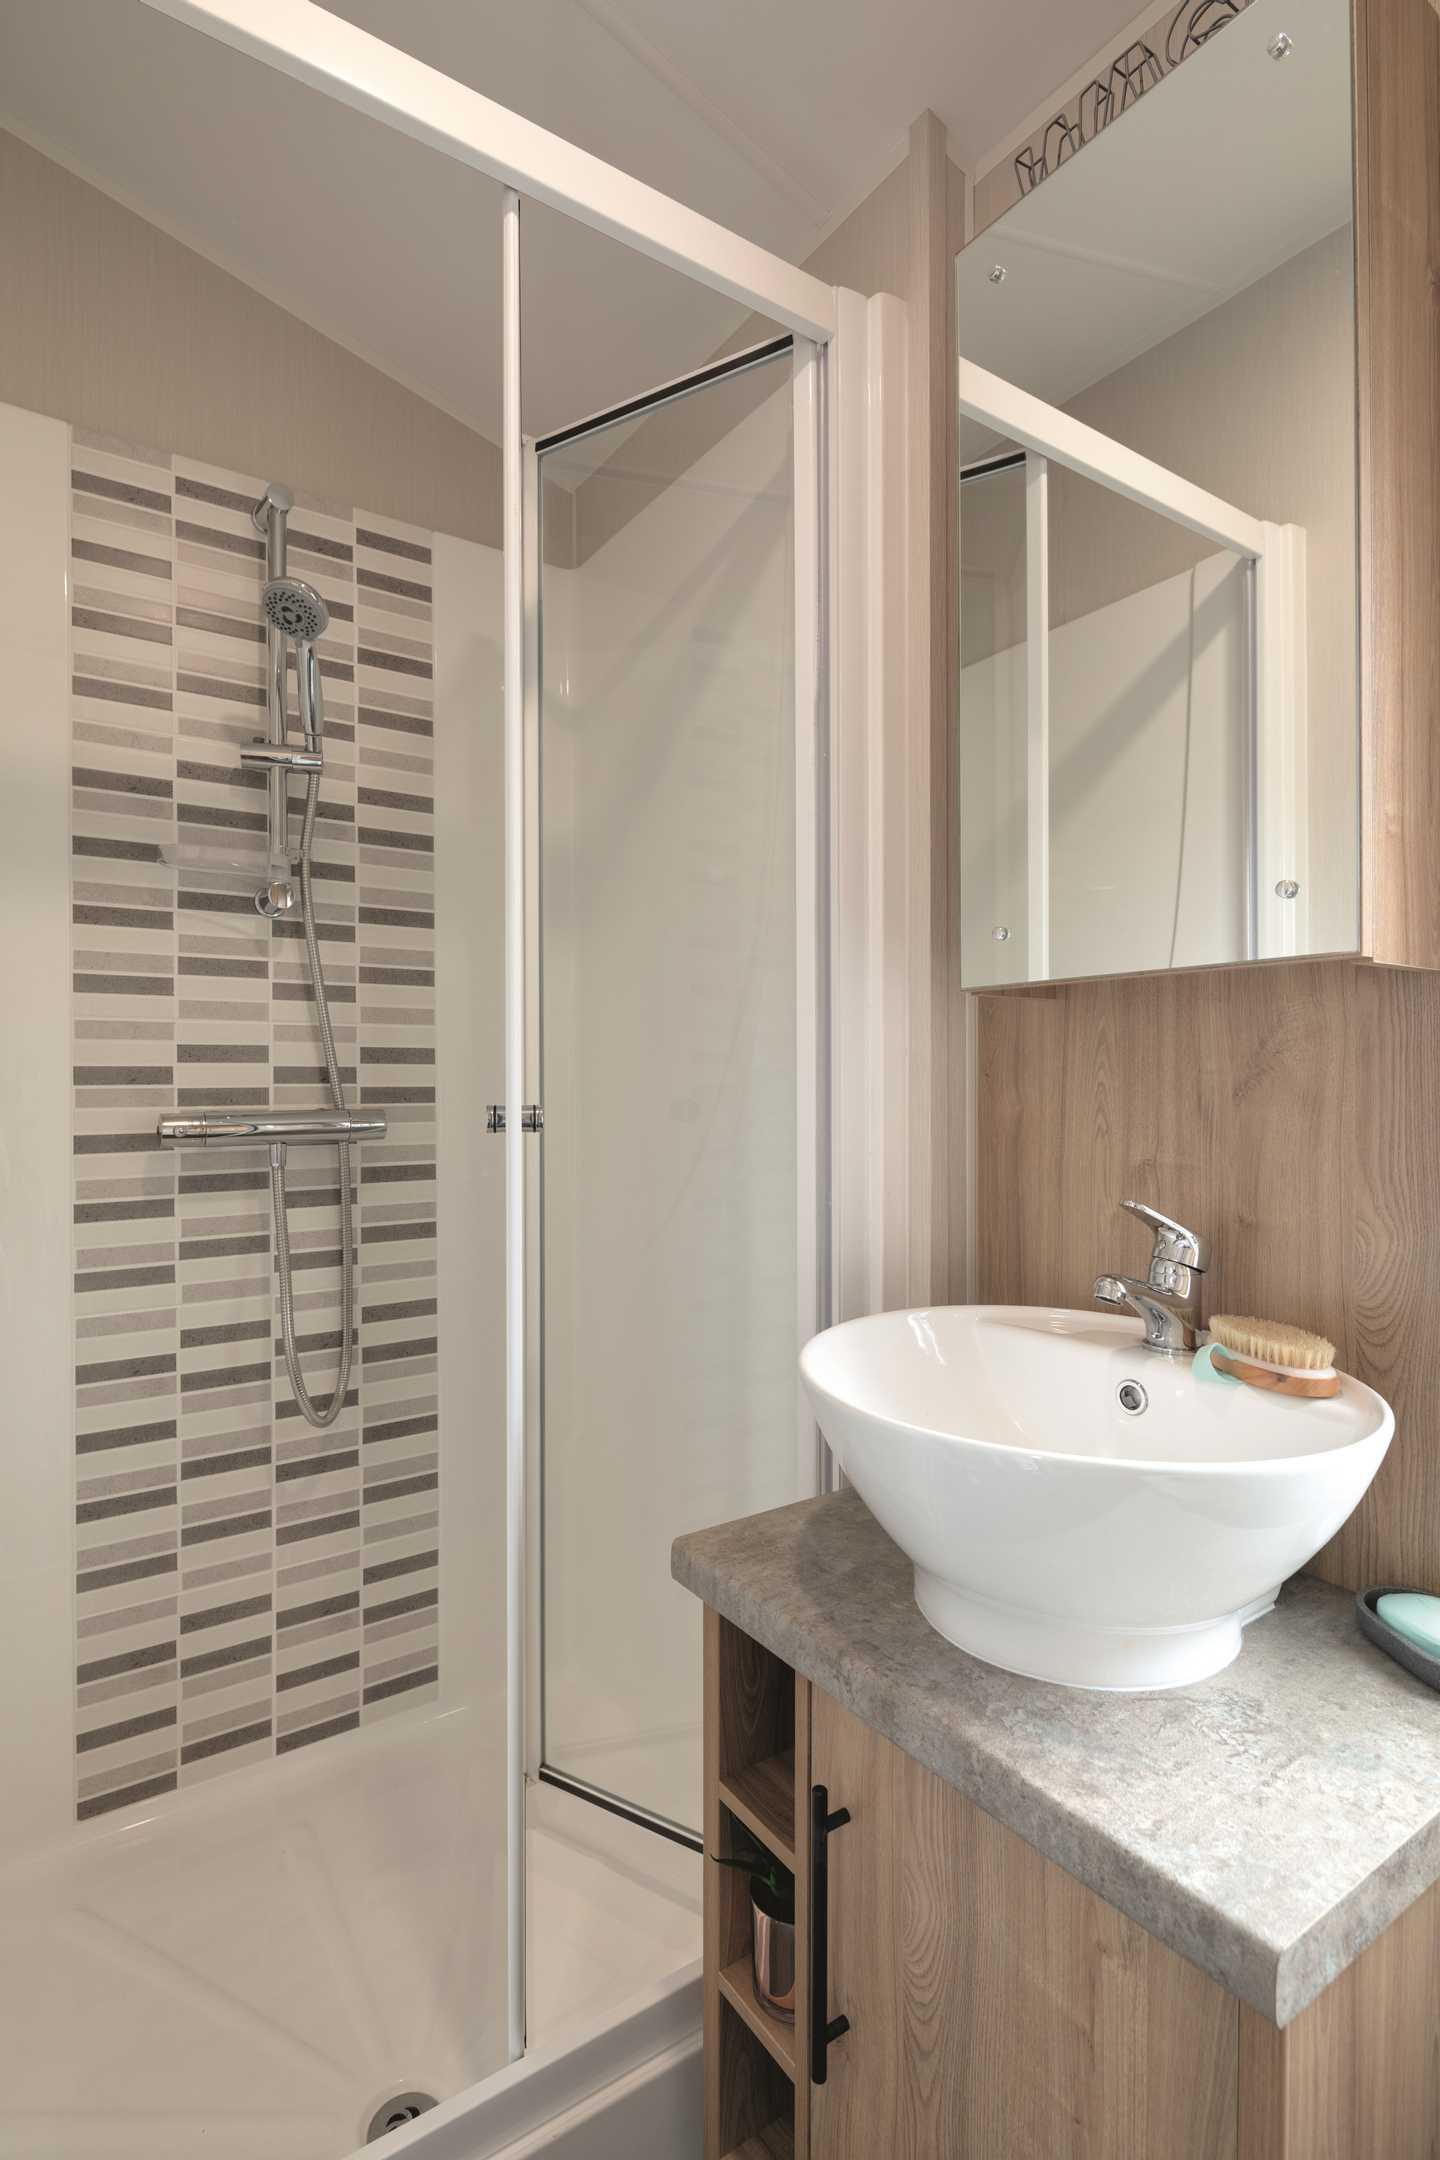 Willerby Waverley bathroom